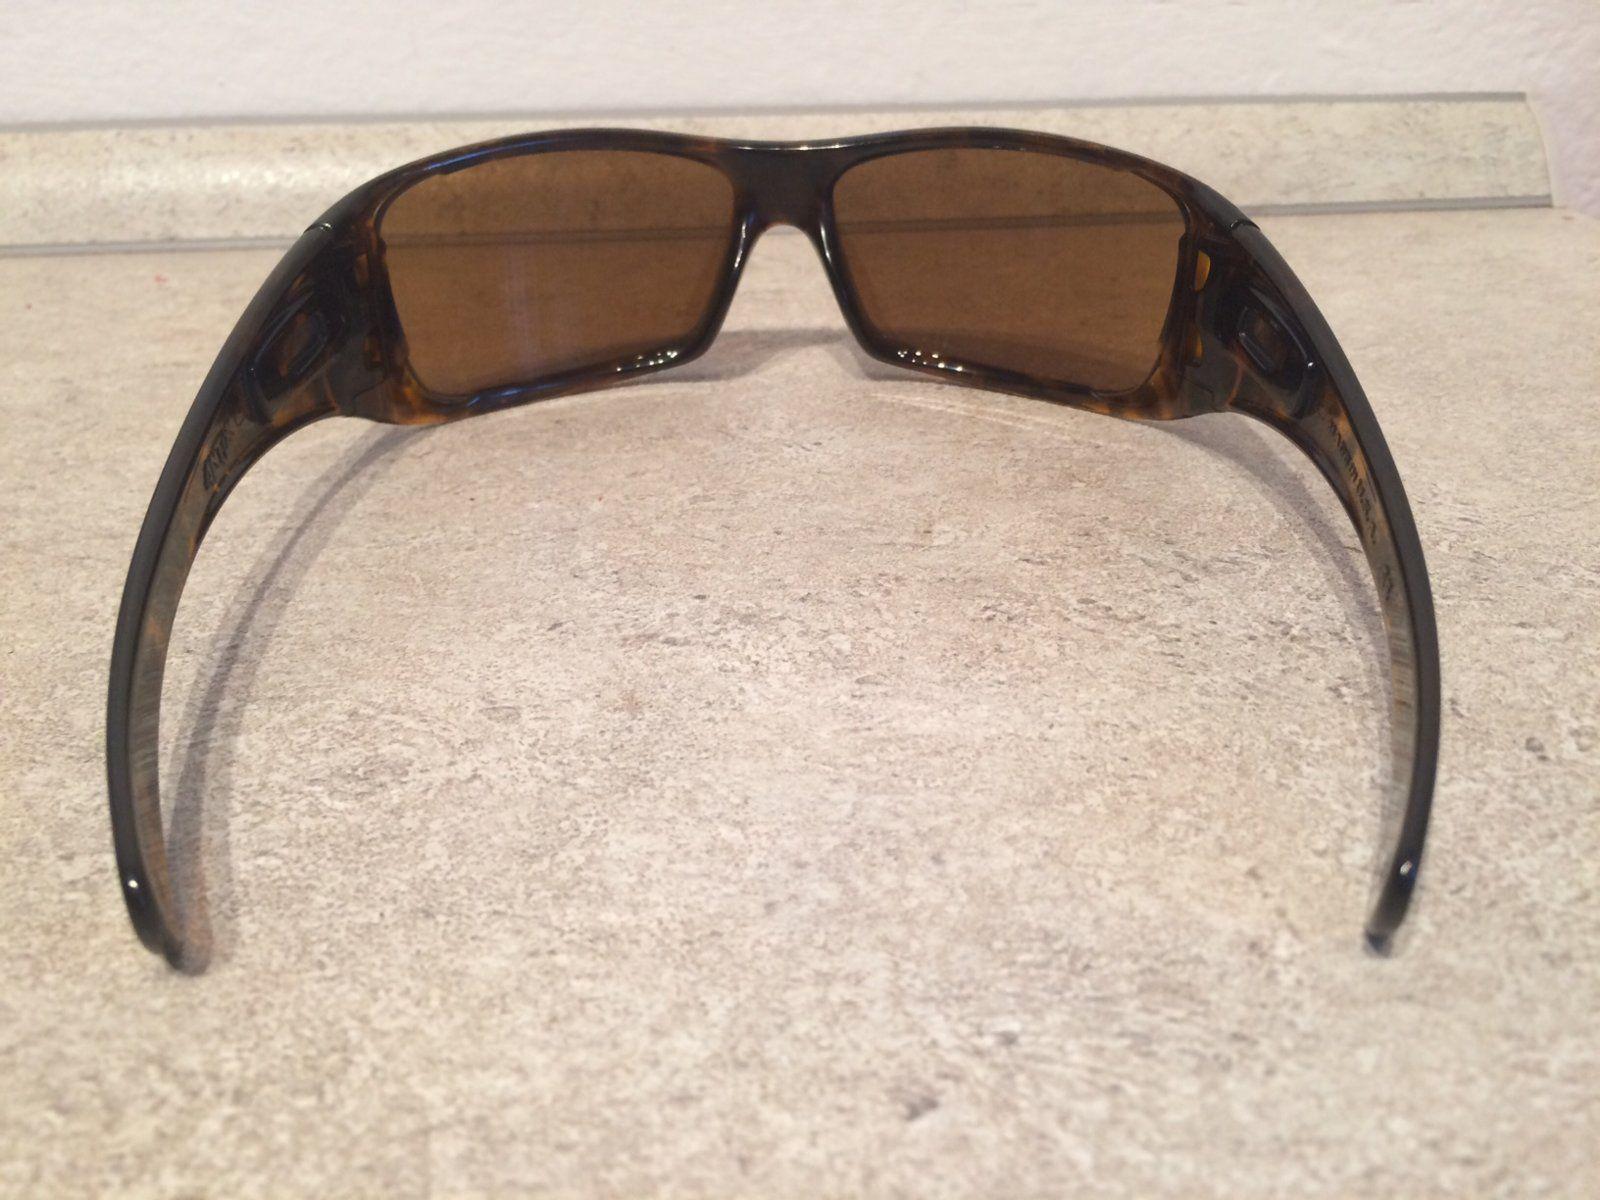 8b64bc8d34 Oakley Antix Brown Tortoise Dark Bronze Sunglasses  03-703 - IMG 6701.JPG